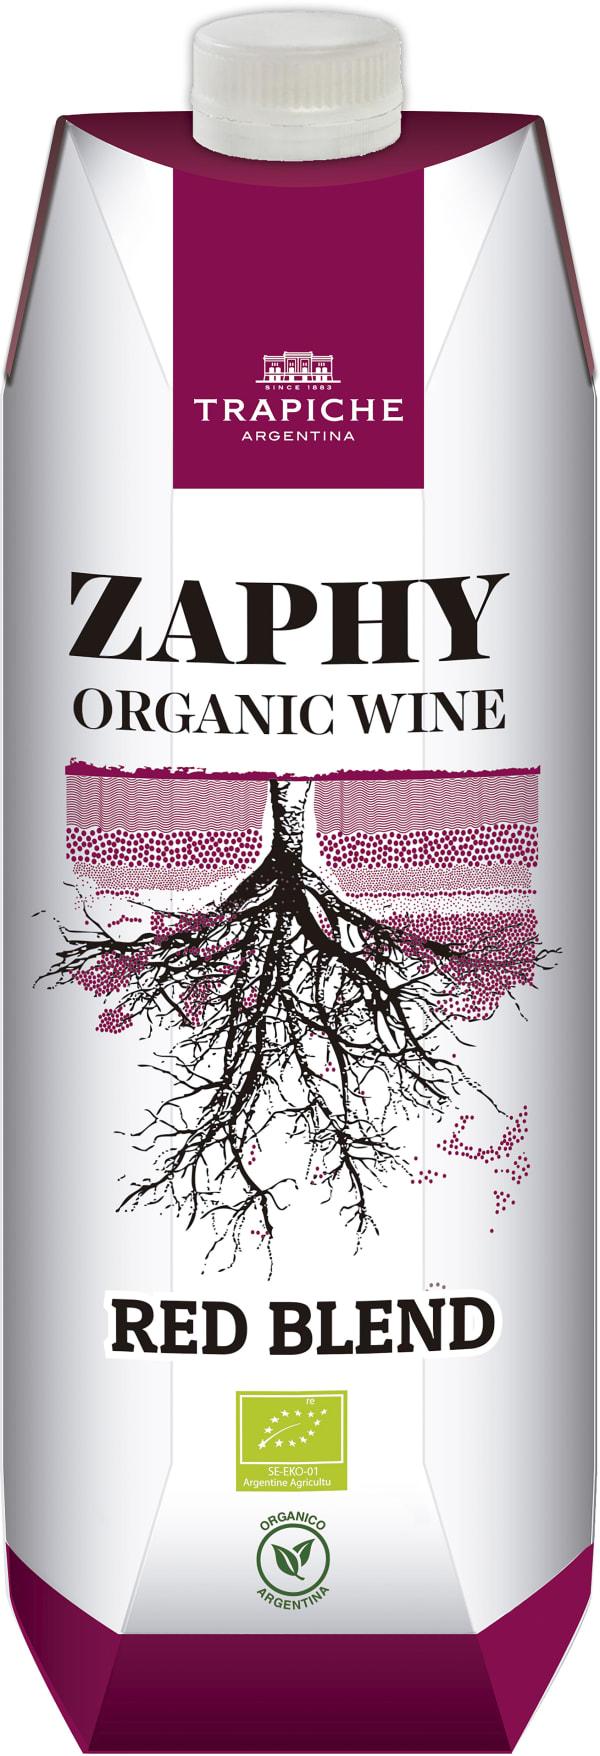 Trapiche Zaphy Organic 2016 kartongförpackning